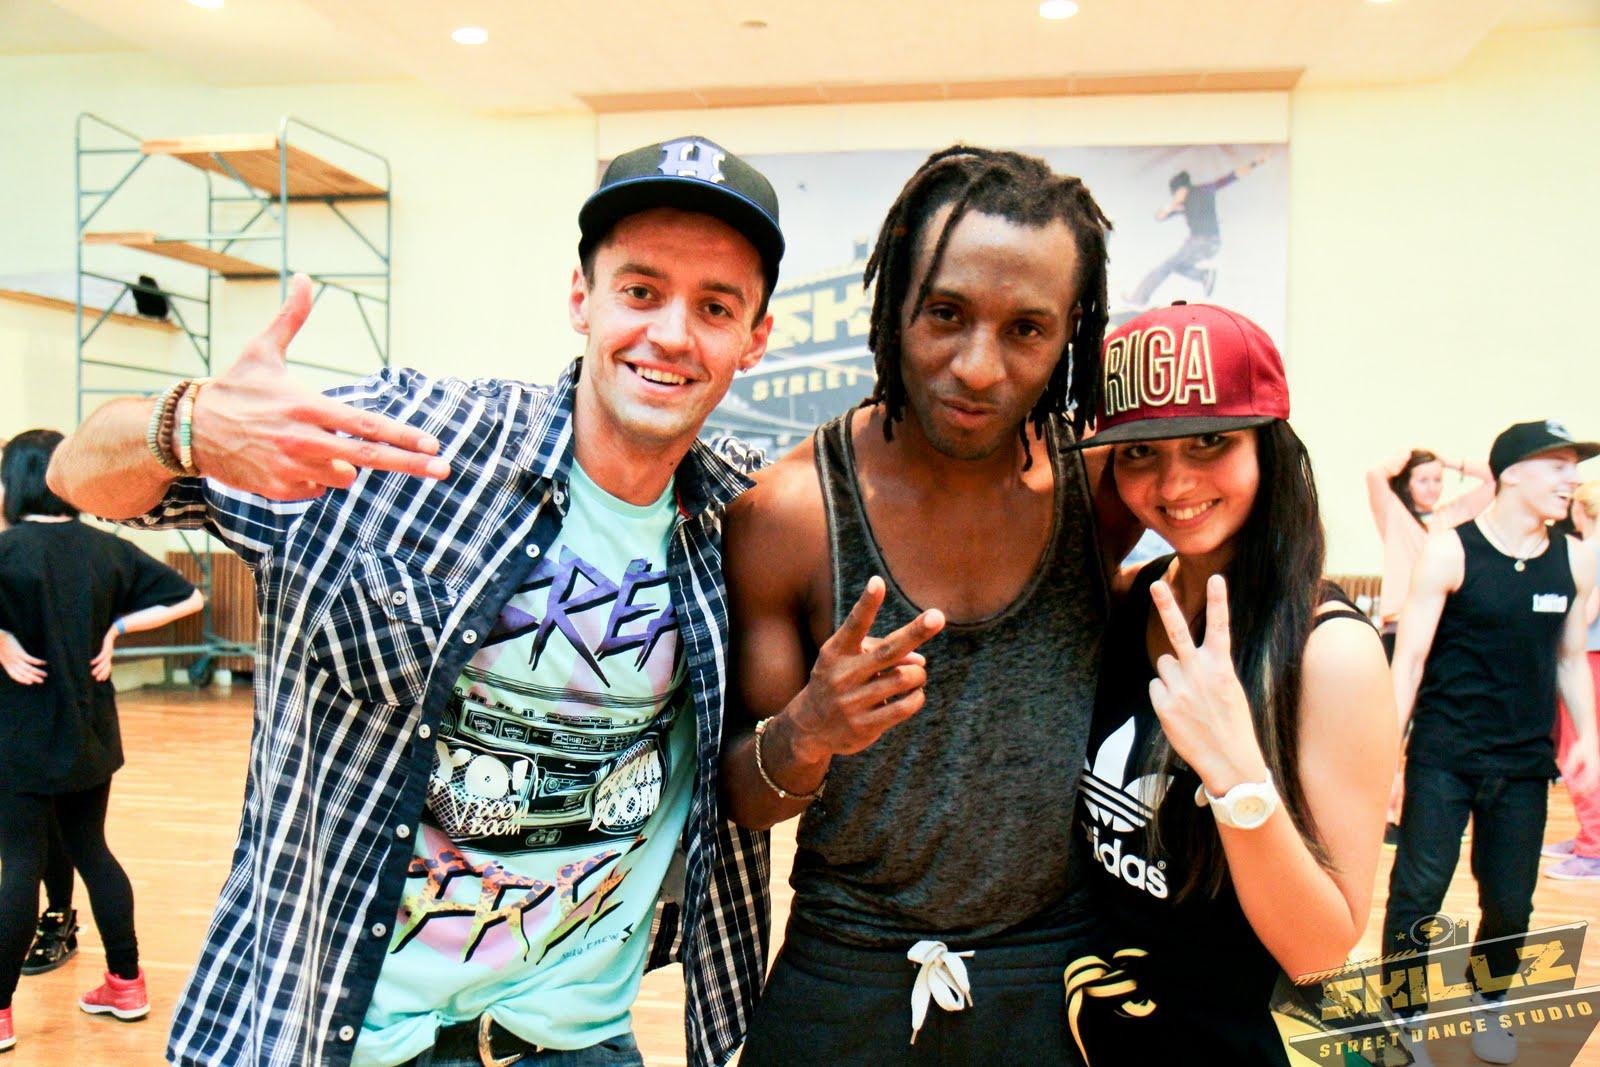 Dancehall workshop with Camron One Shot - IMG_7899.jpg